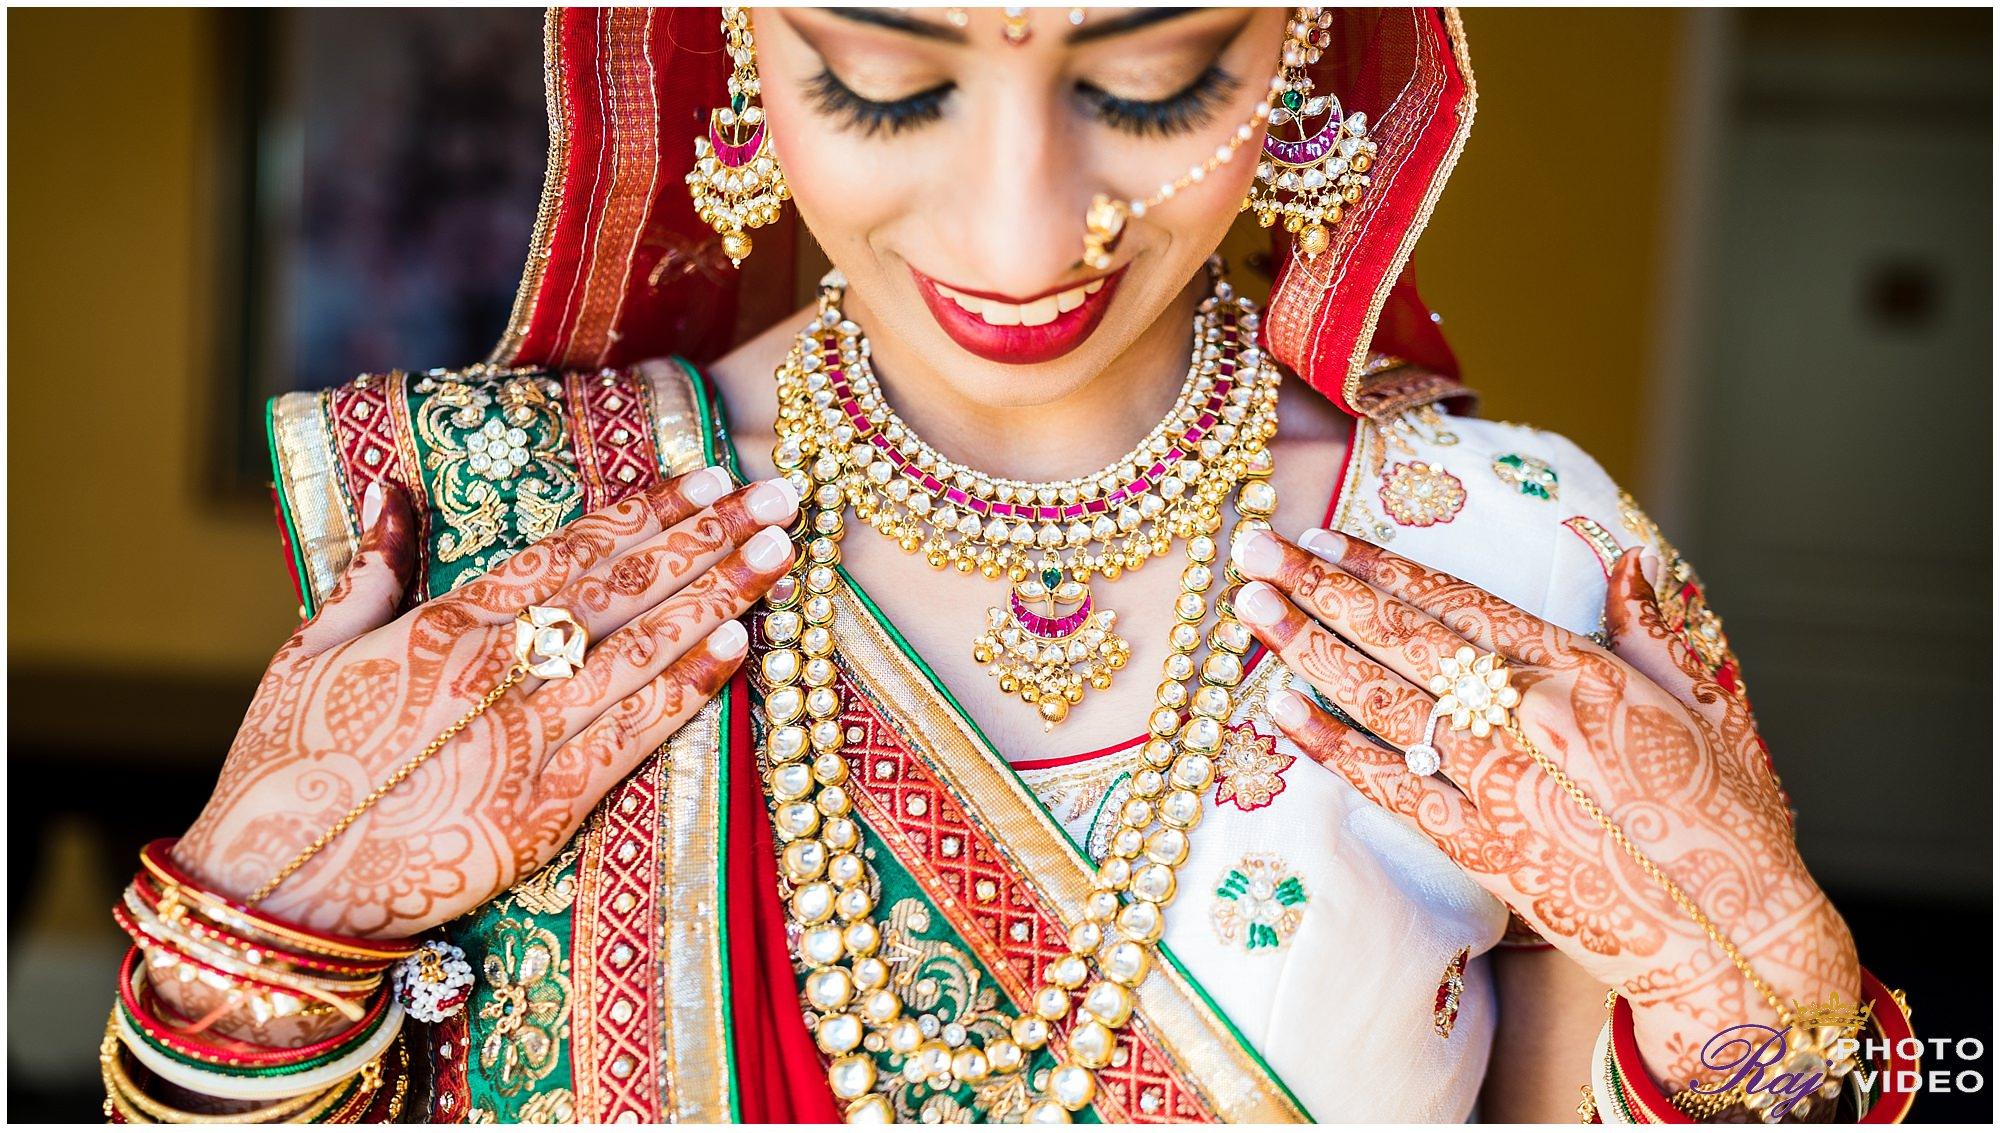 Founders-Inn-and-Spa-Virginia-Beach-VA-Indian-Wedding-Harini-Vivek-31.jpg